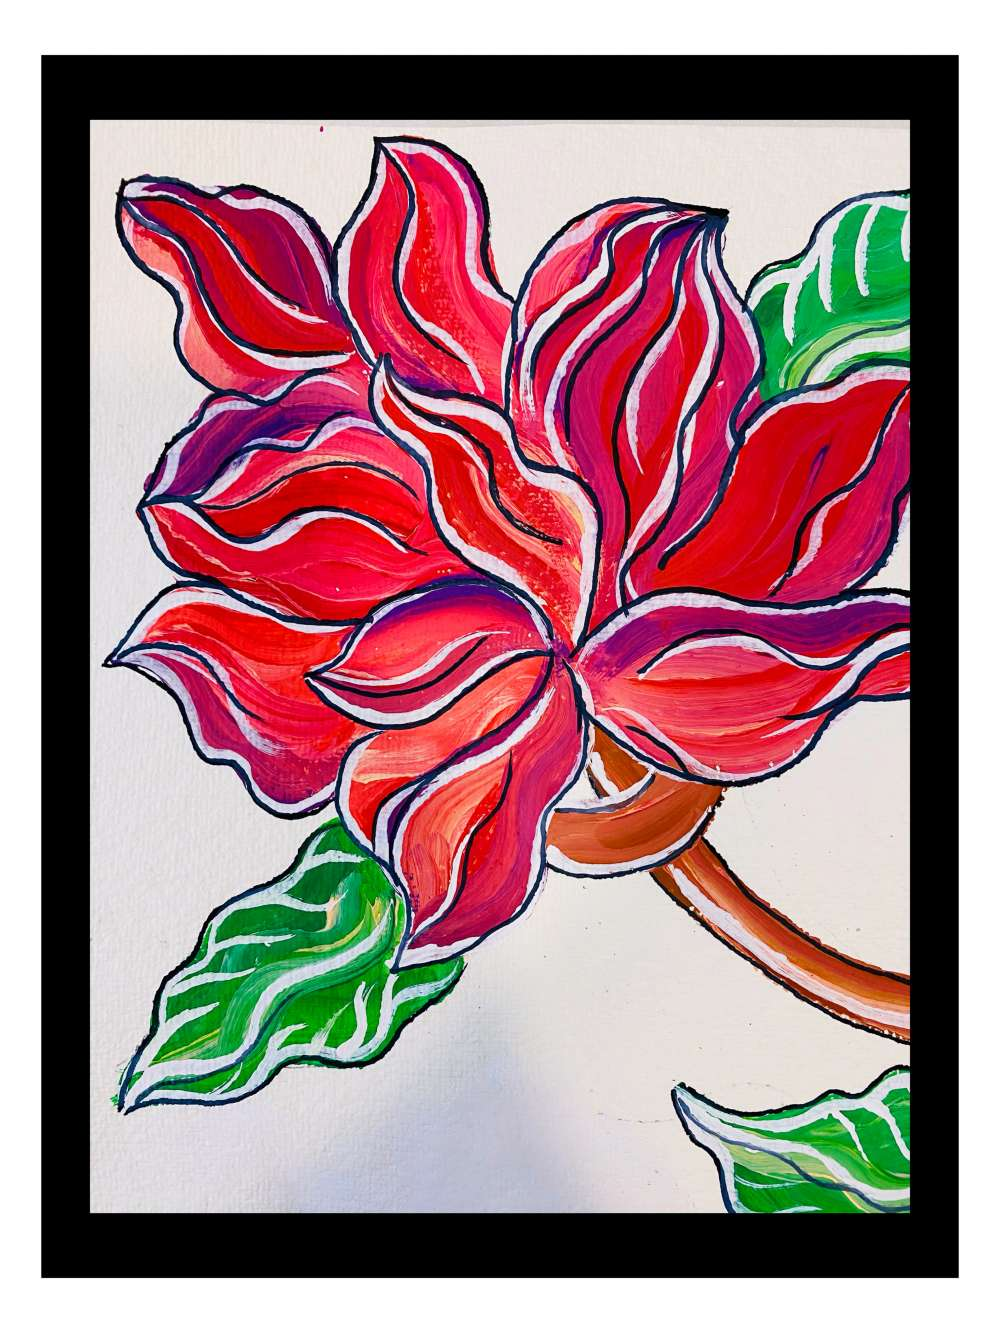 Flower gouache painting